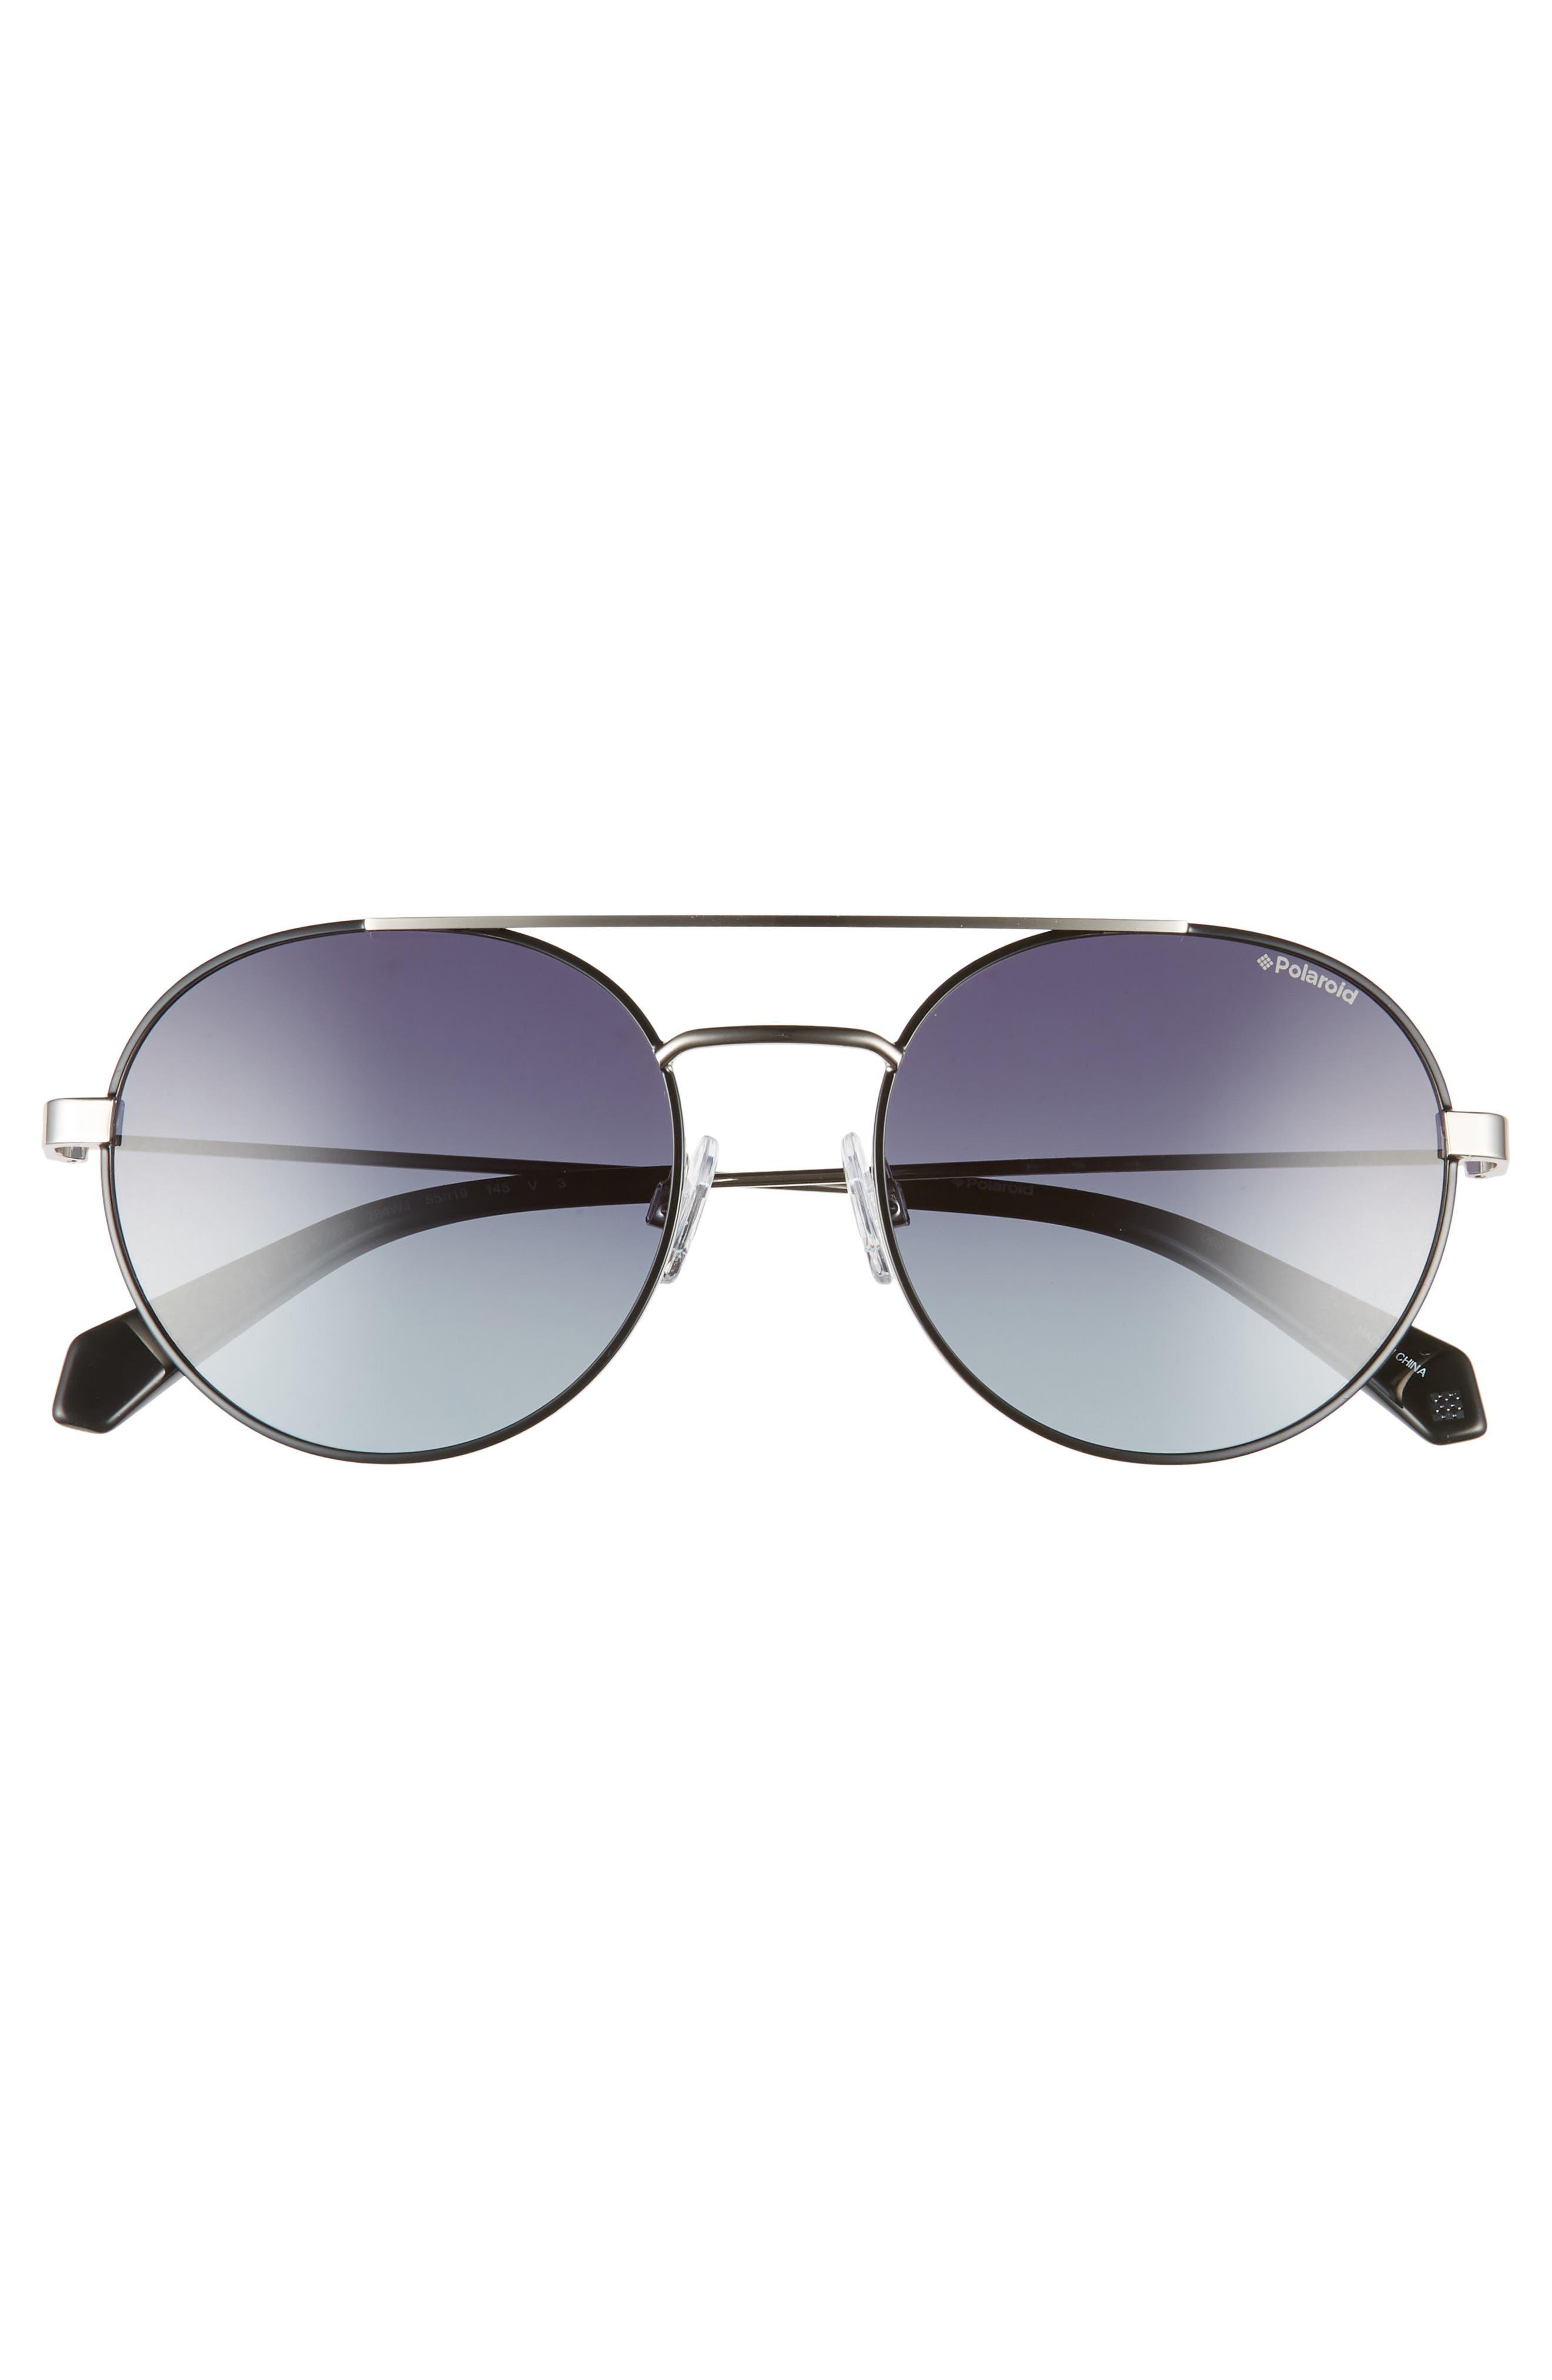 POLAROID EYEWEAR,                             Polaroid 55mm Polarized Round Aviator Sunglasses,                             Alternate thumbnail 3, color,                             BLACK RUTHENIUM